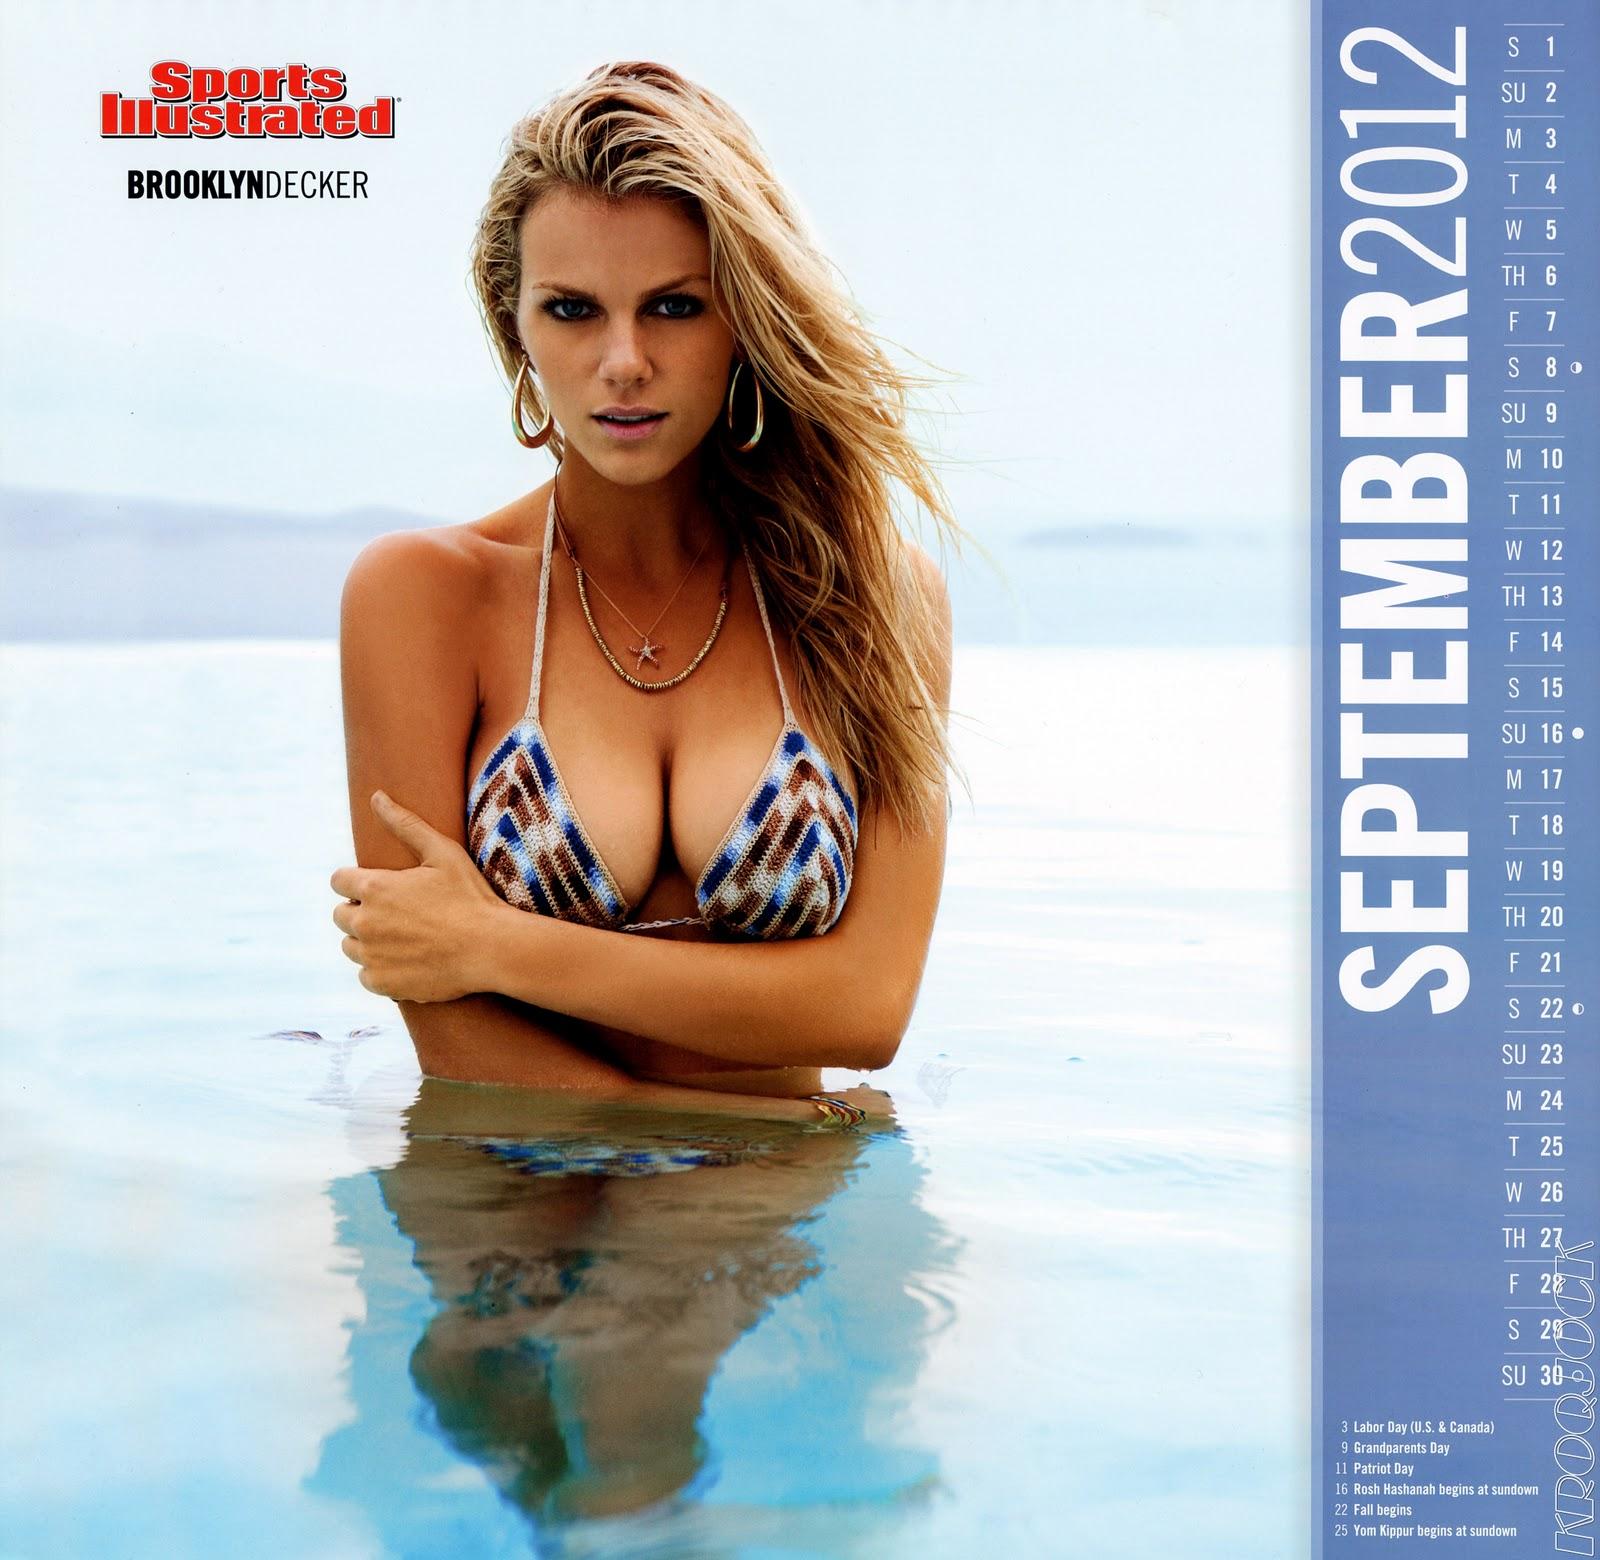 http://4.bp.blogspot.com/-H8lnOiqKY4I/TrtTcsOC4tI/AAAAAAAAL24/Res3pXqrKwc/s1600/Sports+Illustrated+2012+Swimsuit+Calendar+%252811%2529.jpg